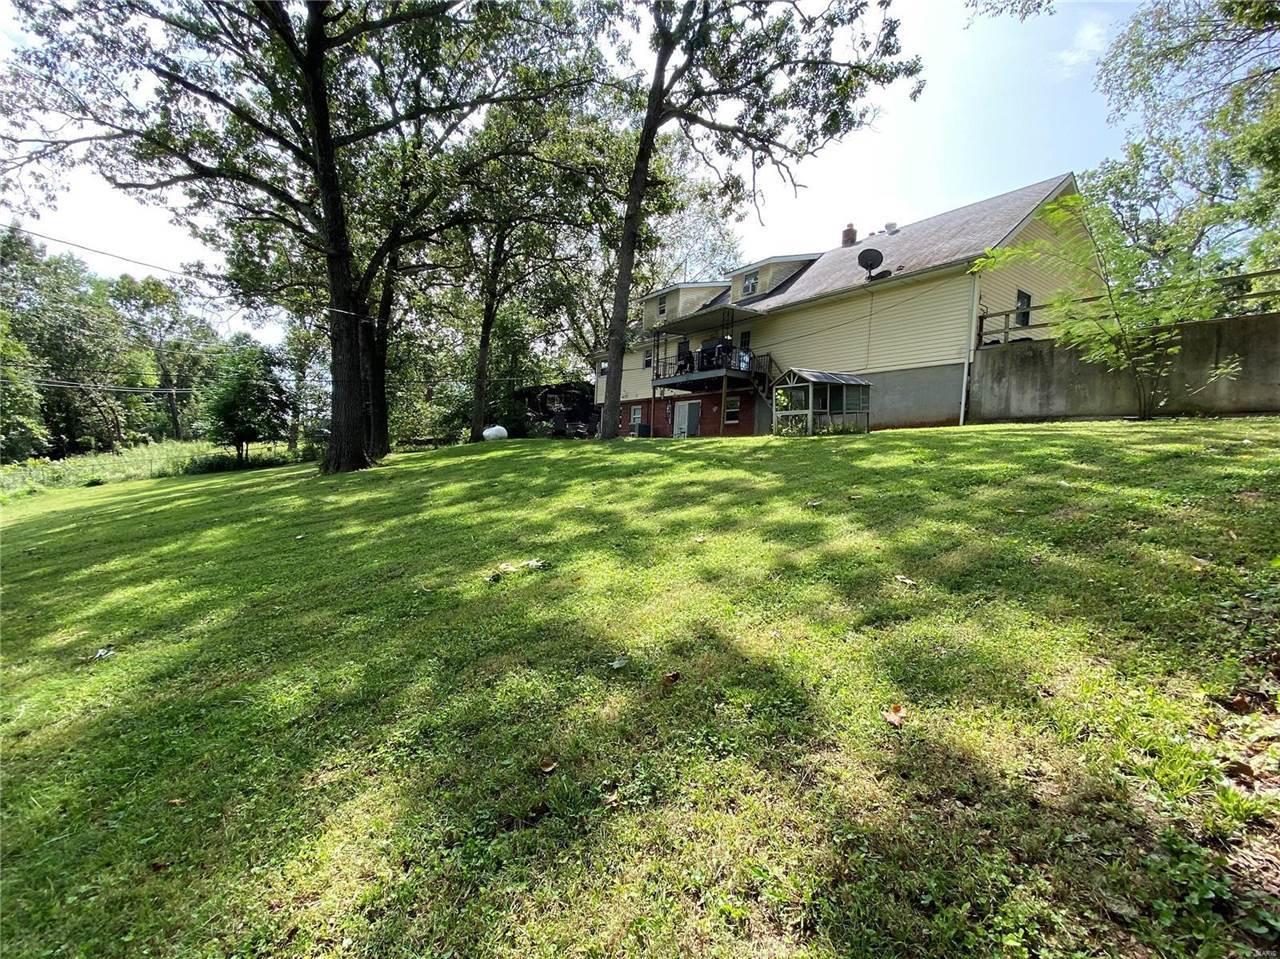 1811 Long Drive, Waynesville, MO 65583